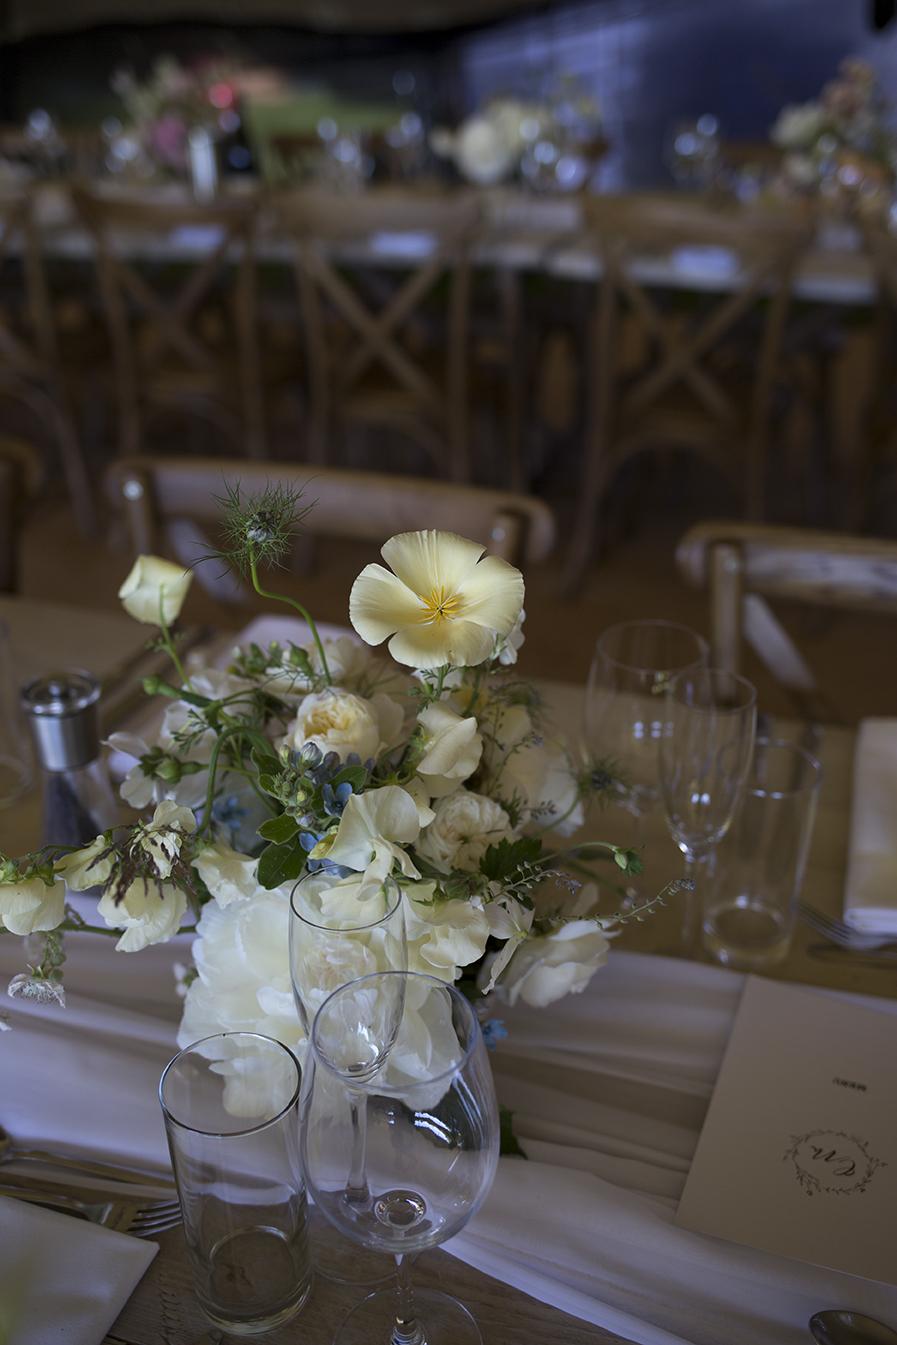 English Country Wedding Flowers | Aesme Flowers LondonEnglish Country Wedding Flowers | Aesme Flowers London